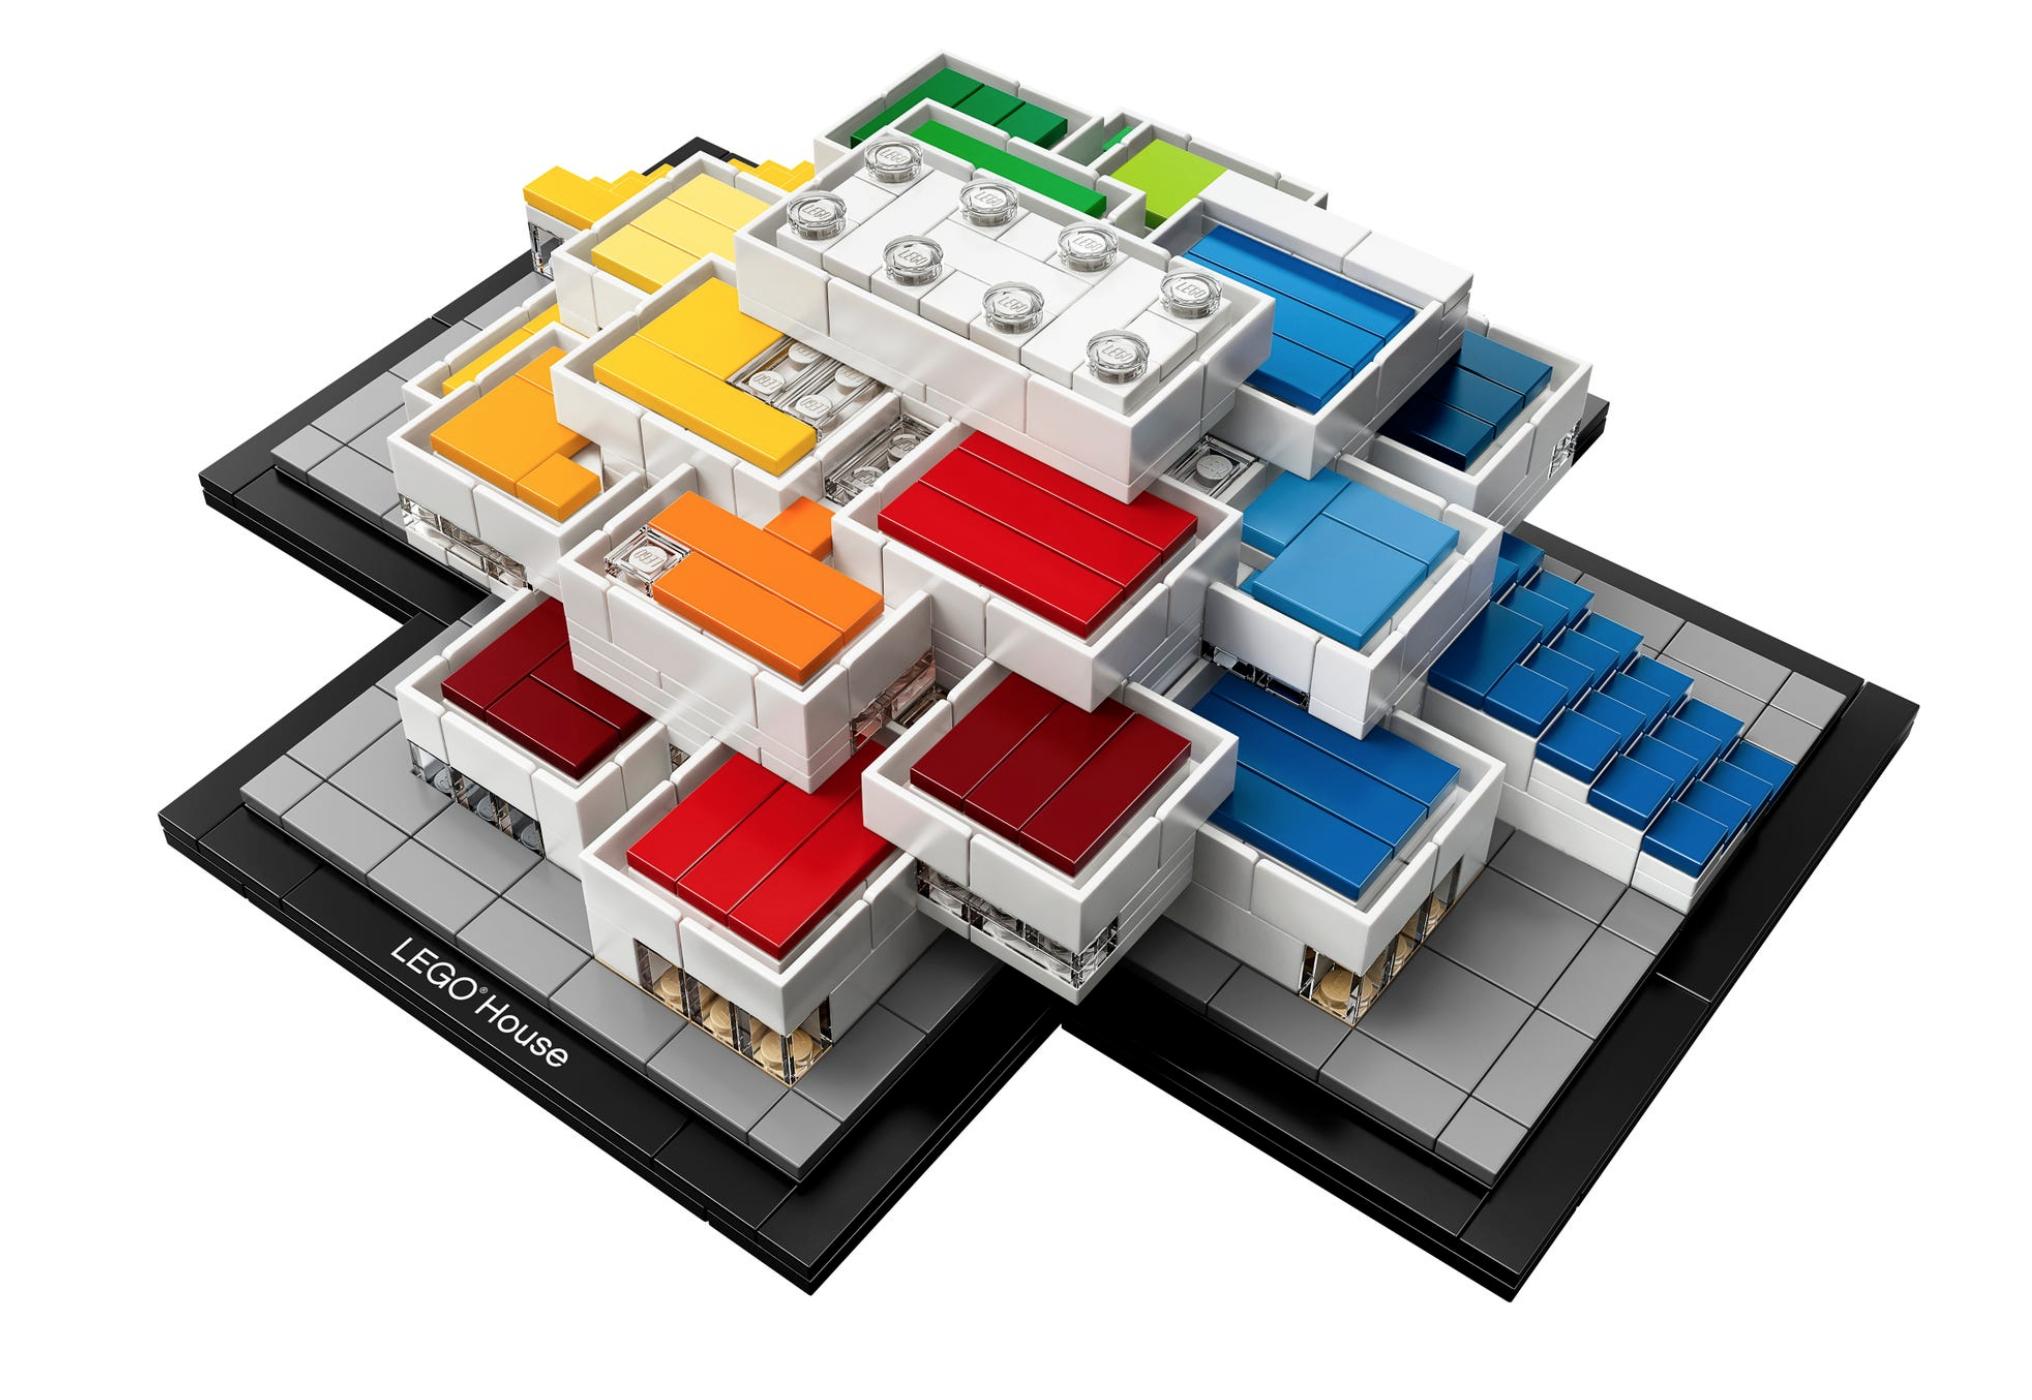 Lego house Architecture - £48.94 delivered @ Lego Shop